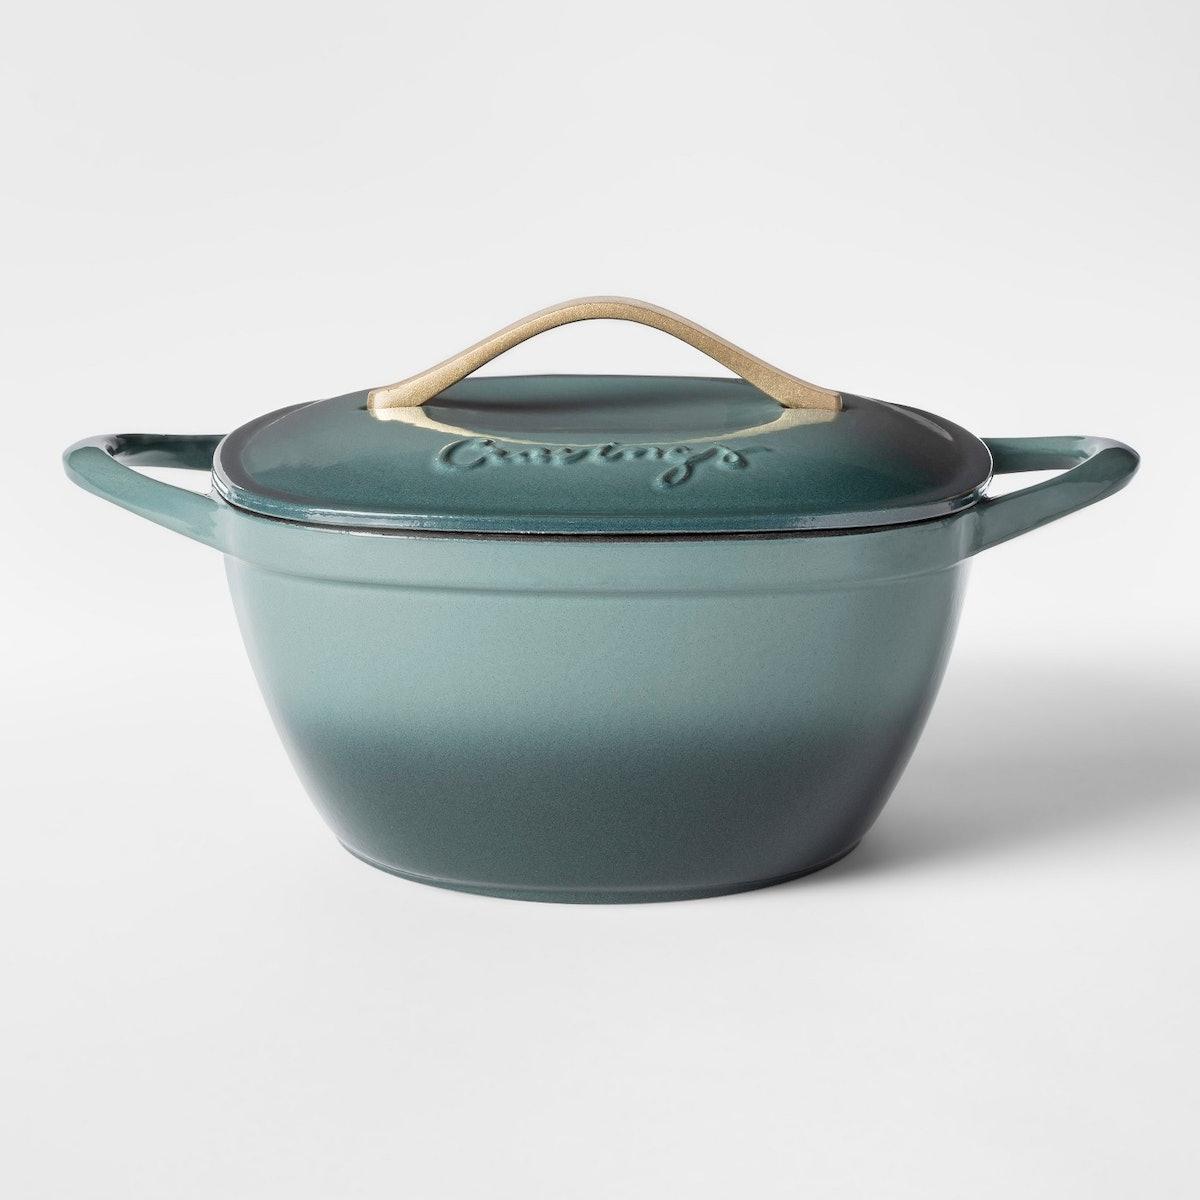 Cravings by Chrissy Teigen Cast Iron Enameled Dutch Oven